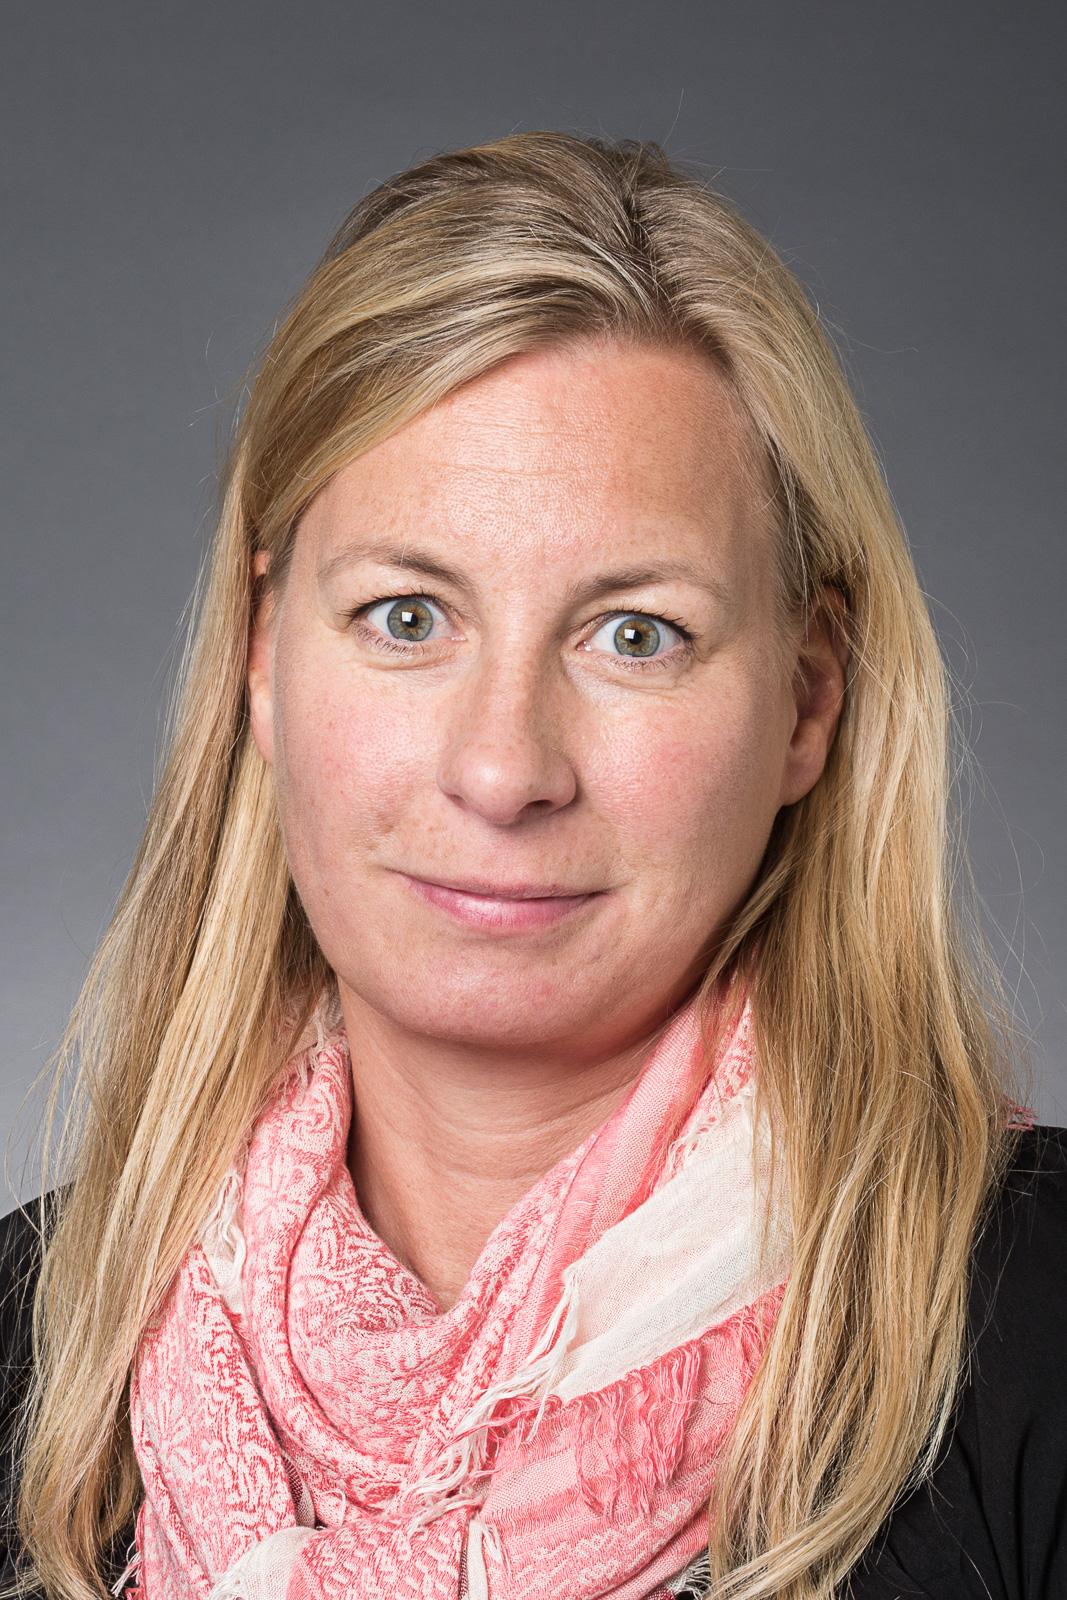 Louise Kruse Fischmann